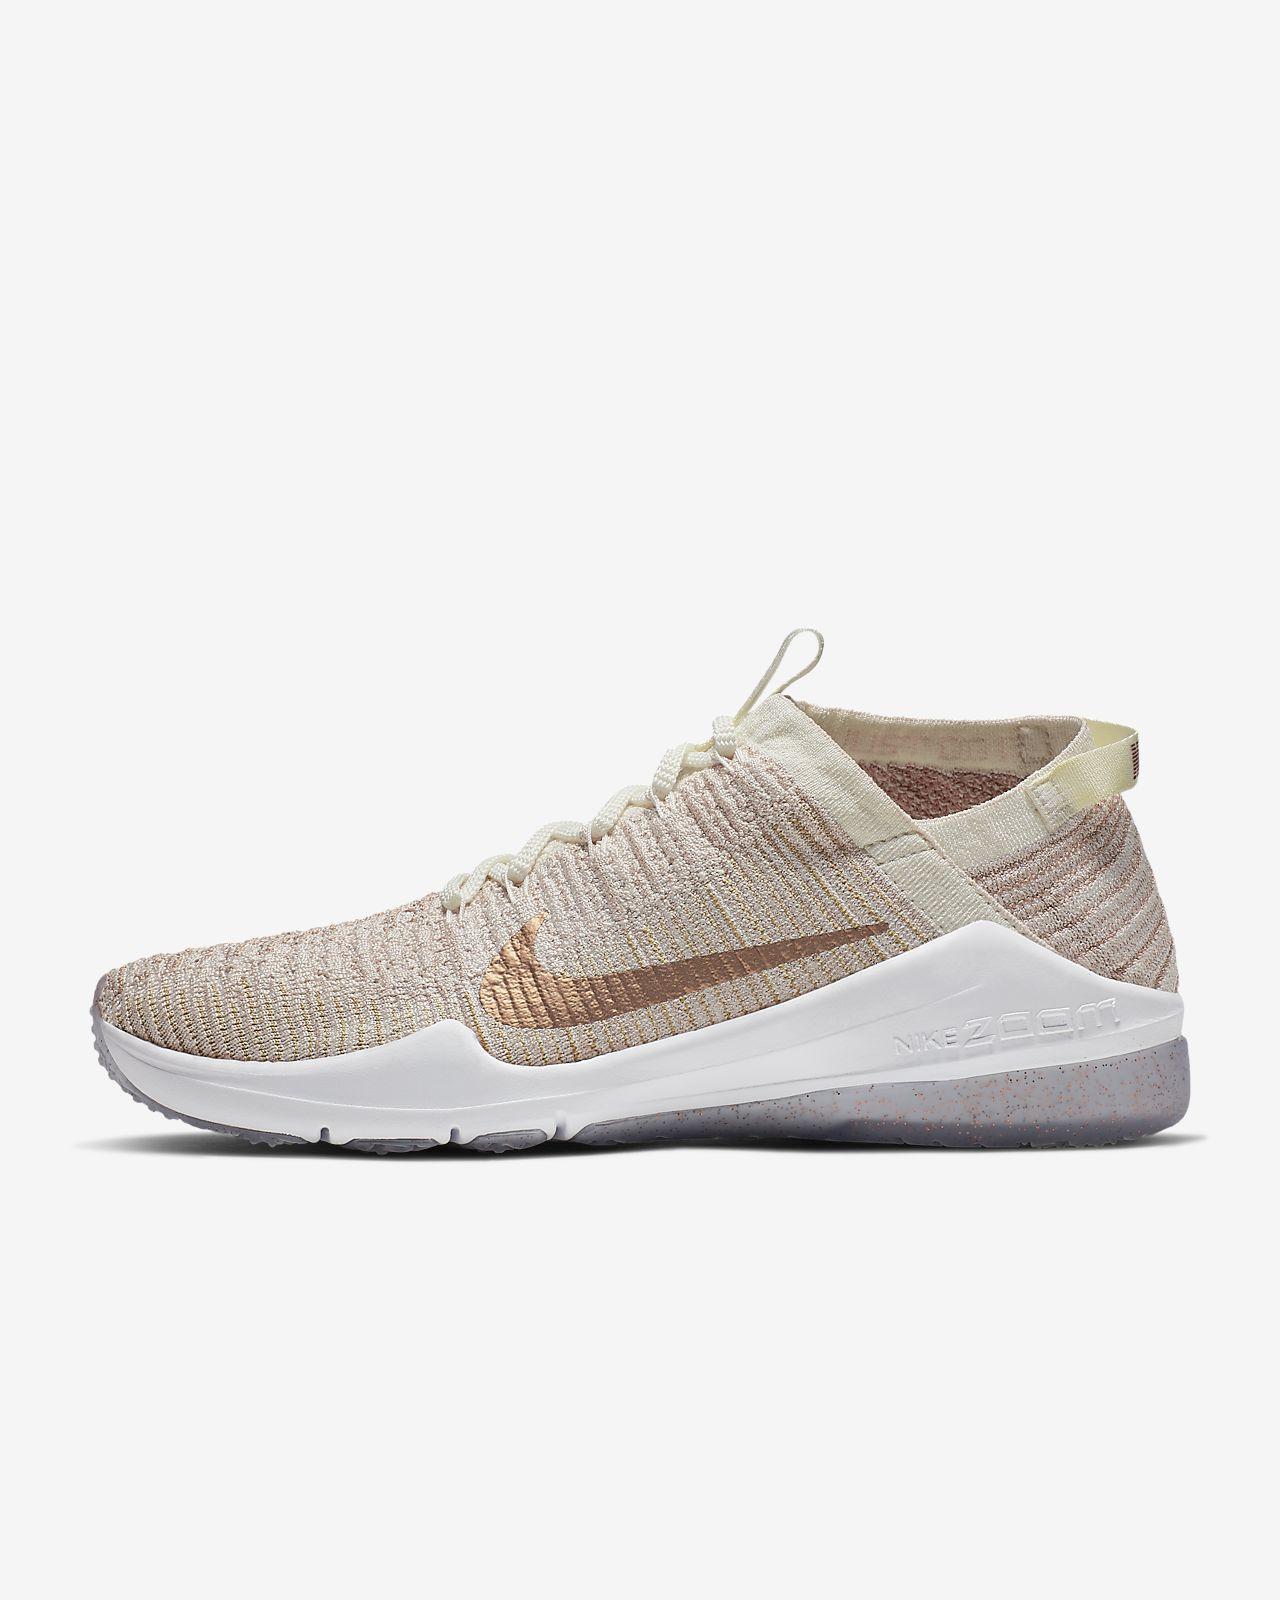 Sapatilhas de treino Nike Air Zoom Fearless Flyknit 2 Metallic para mulher